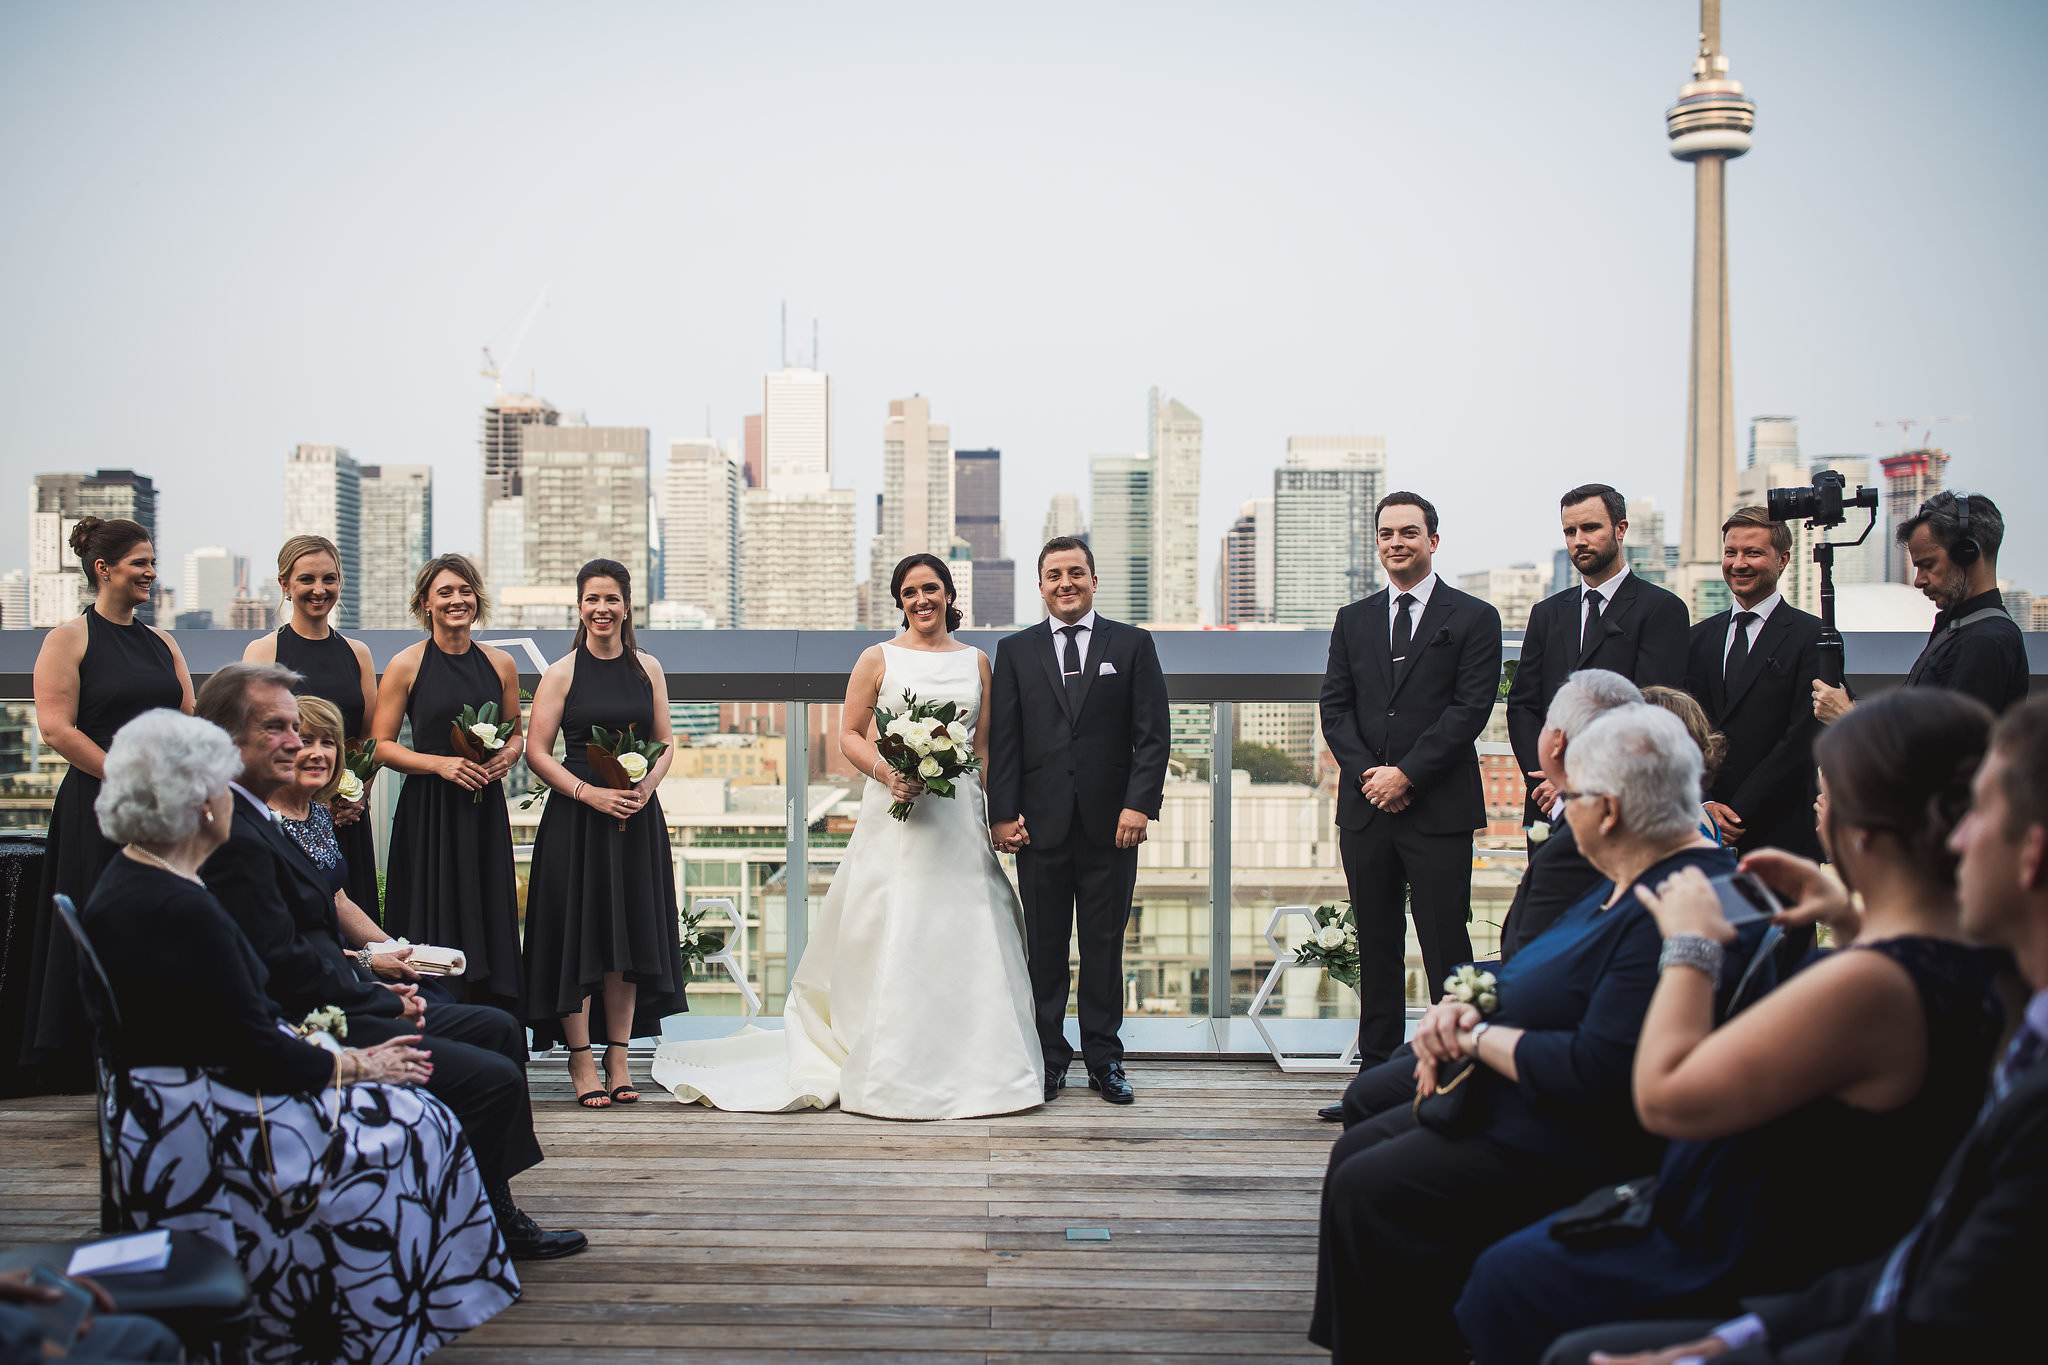 Cristin Rob Thompson Hotel Wedding Photos 506 - Thompson Hotel Wedding Photos